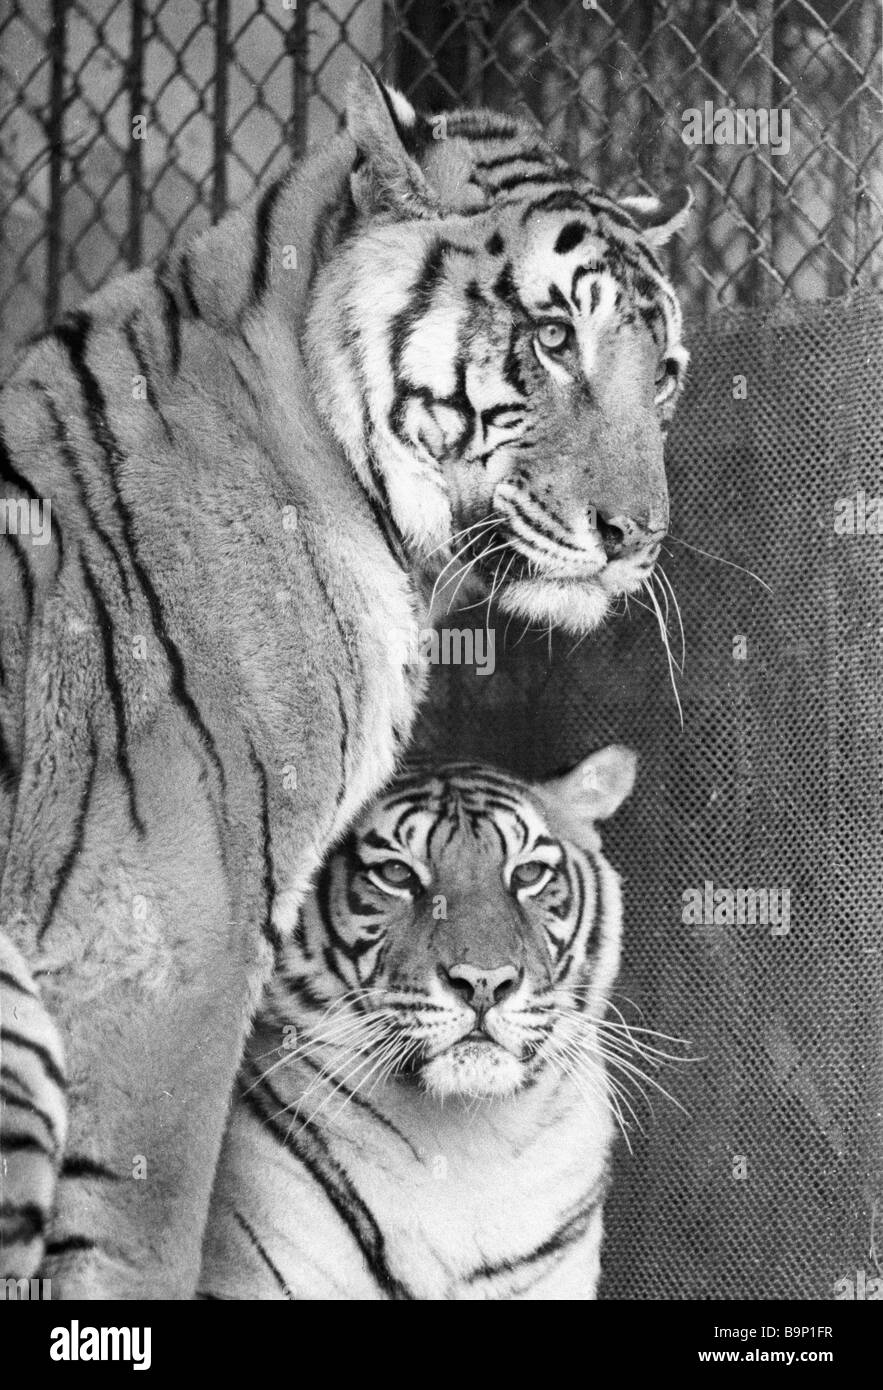 Raj and Rani tigers given as gifts to Jawaharlal Nehru in 1955 at the Tashkent Zoo - Stock Image